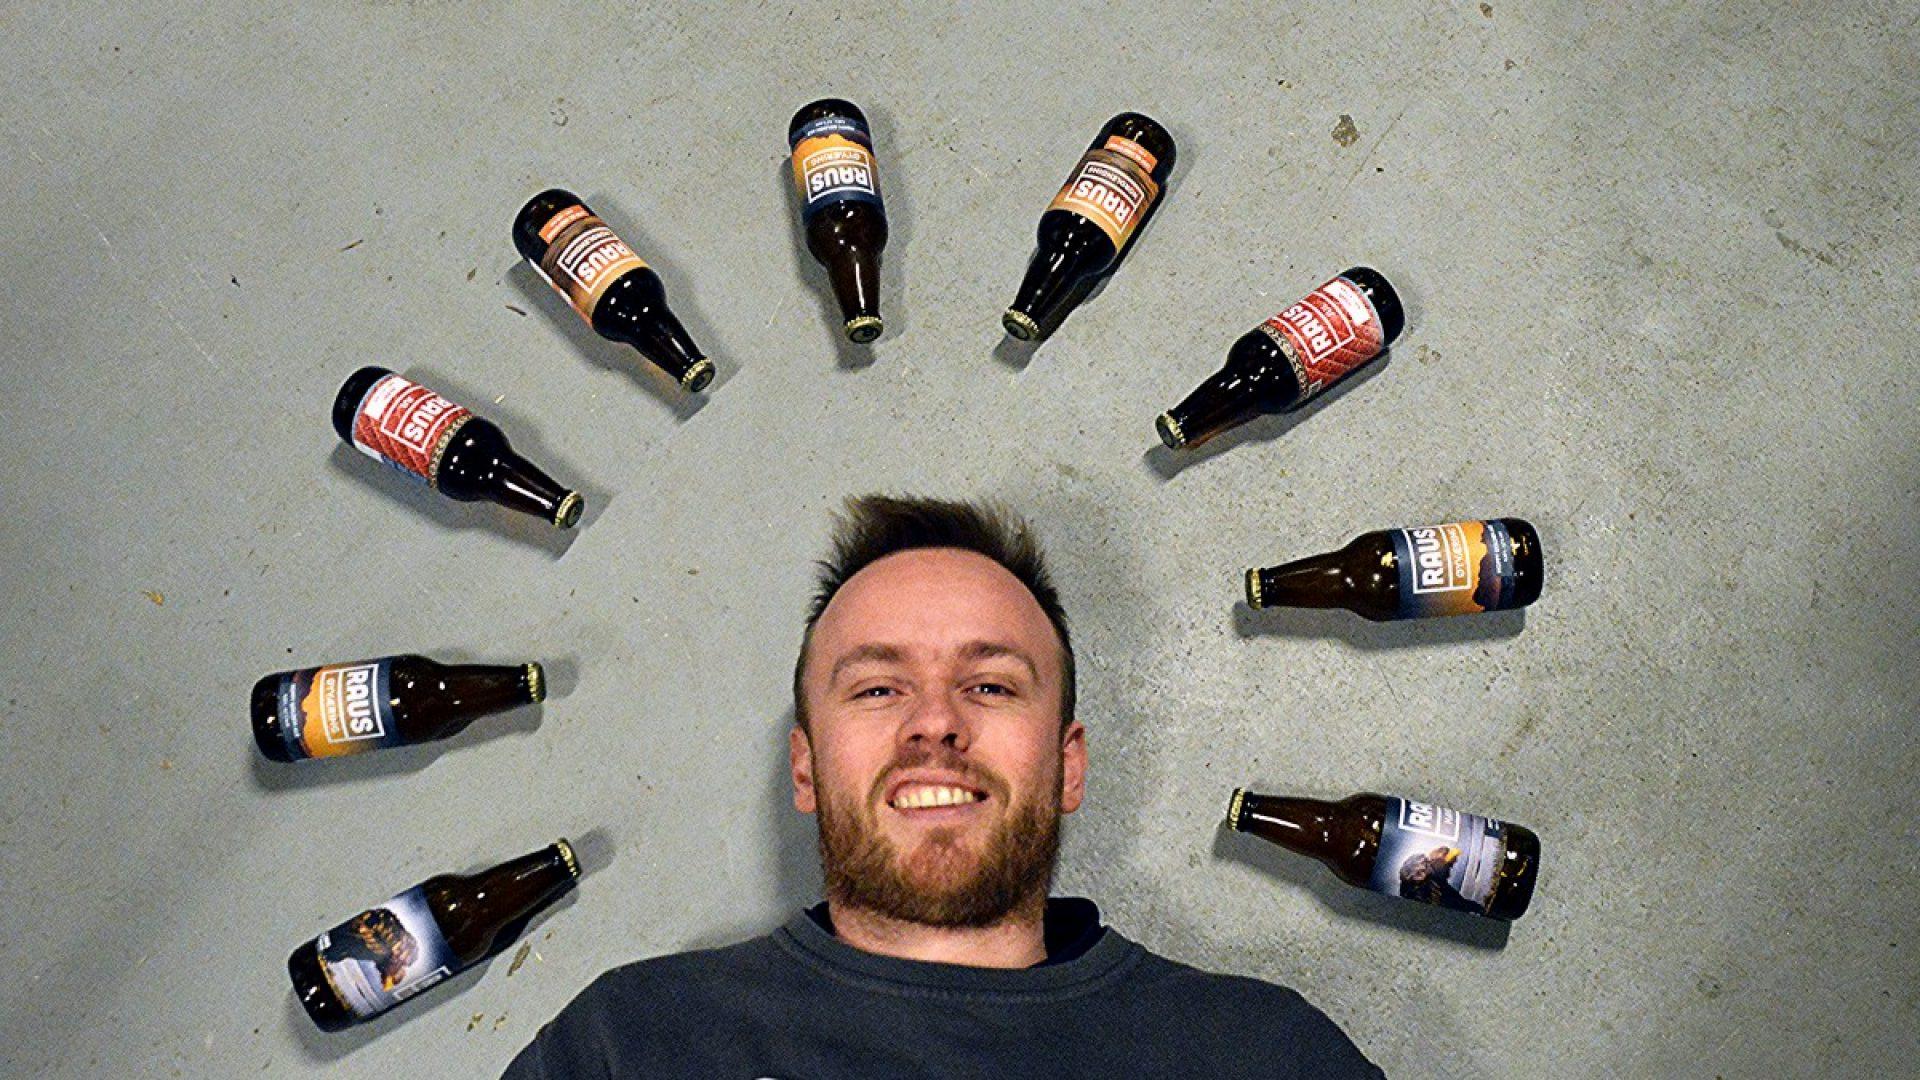 Ølflasker peker på Kristian som ligger på gulvet